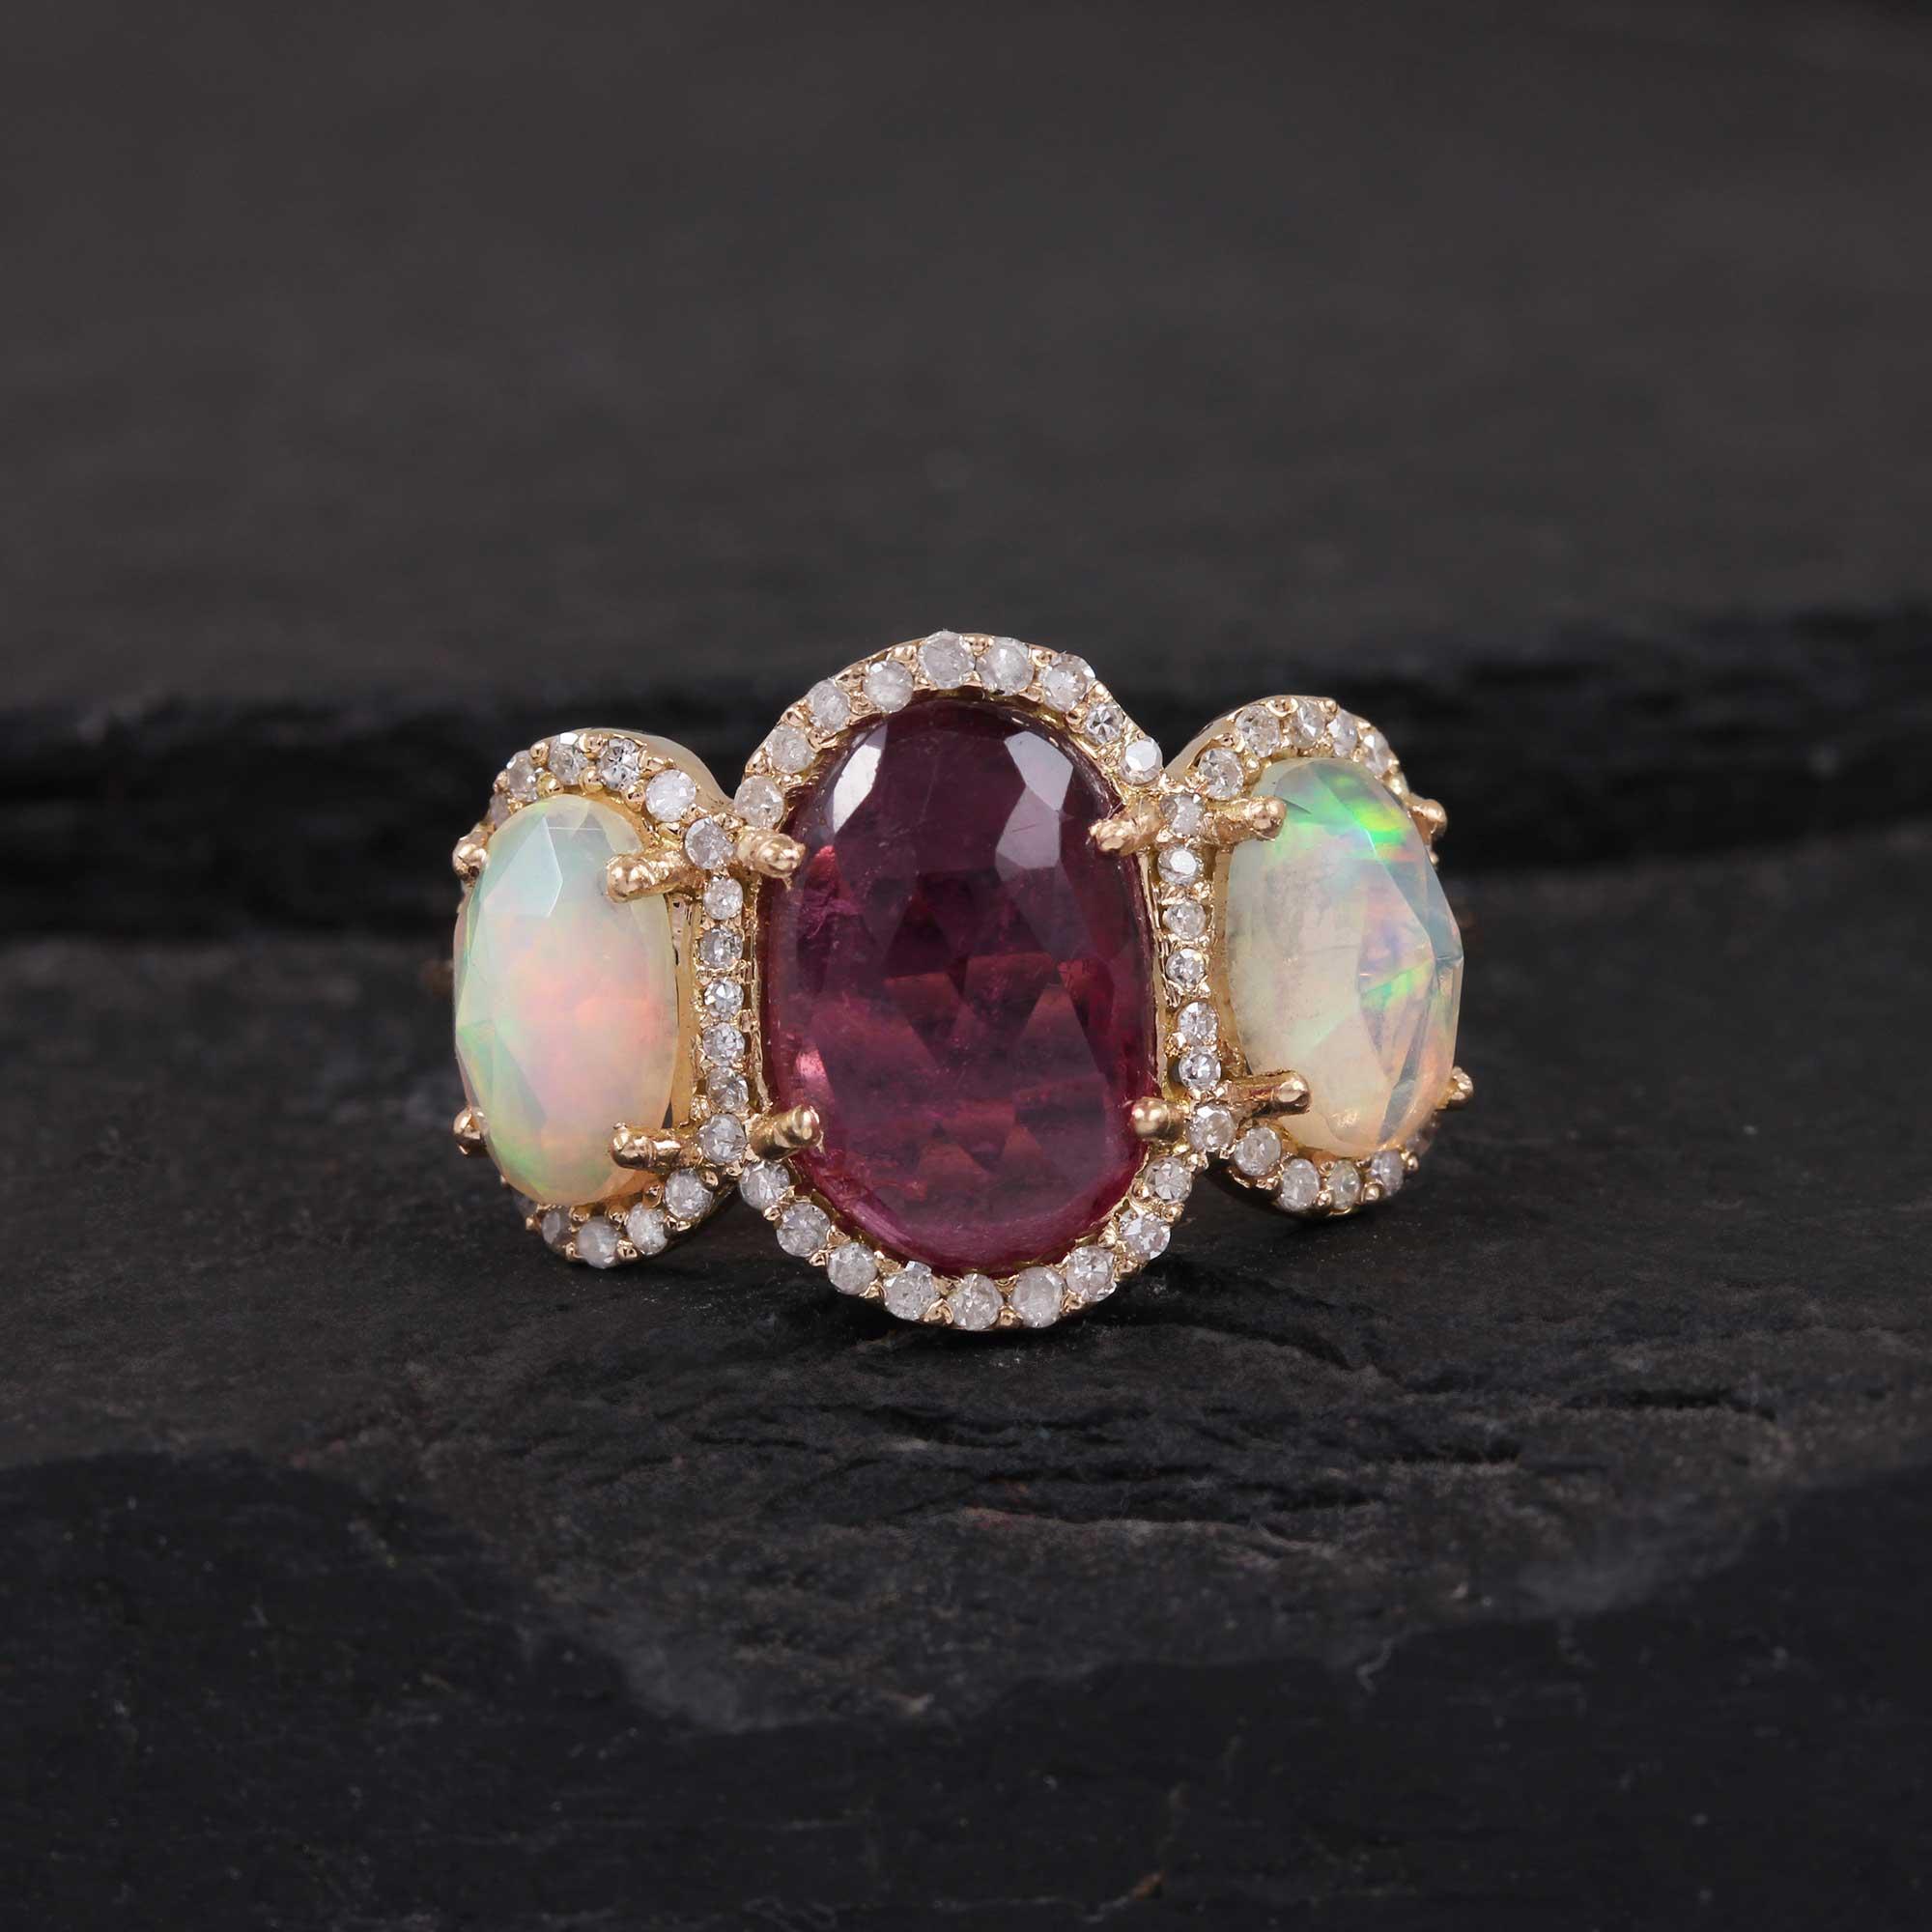 Opal Tourmaline Pave Diamond 14K Solid Gold Ring